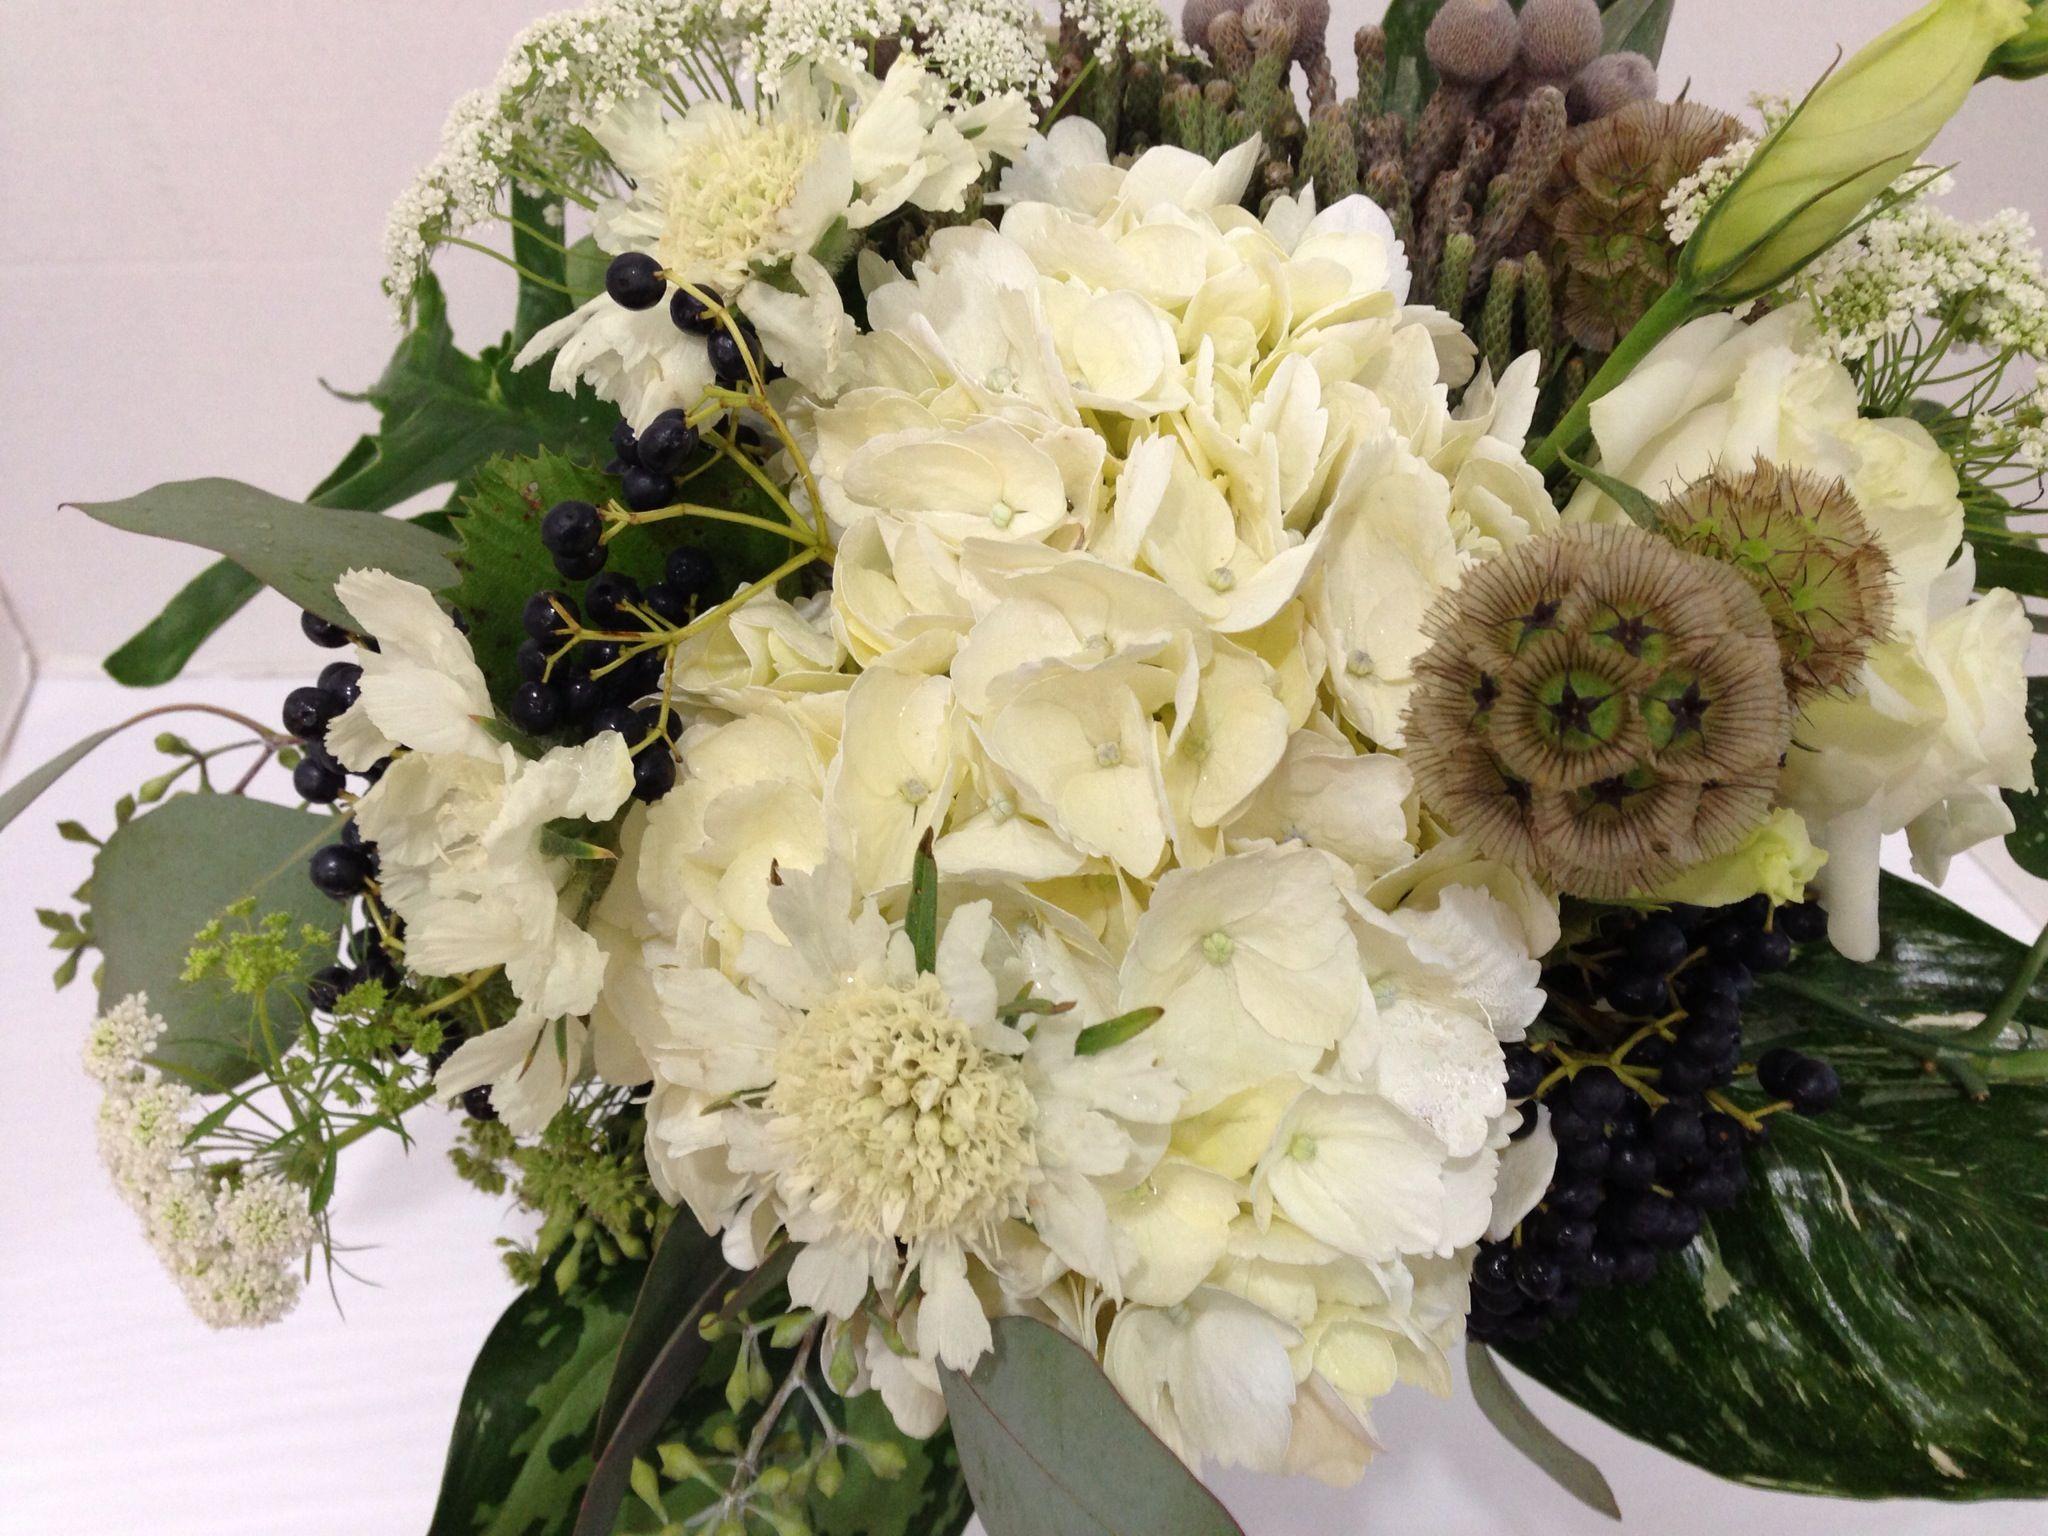 A beautiful natural bouquet!